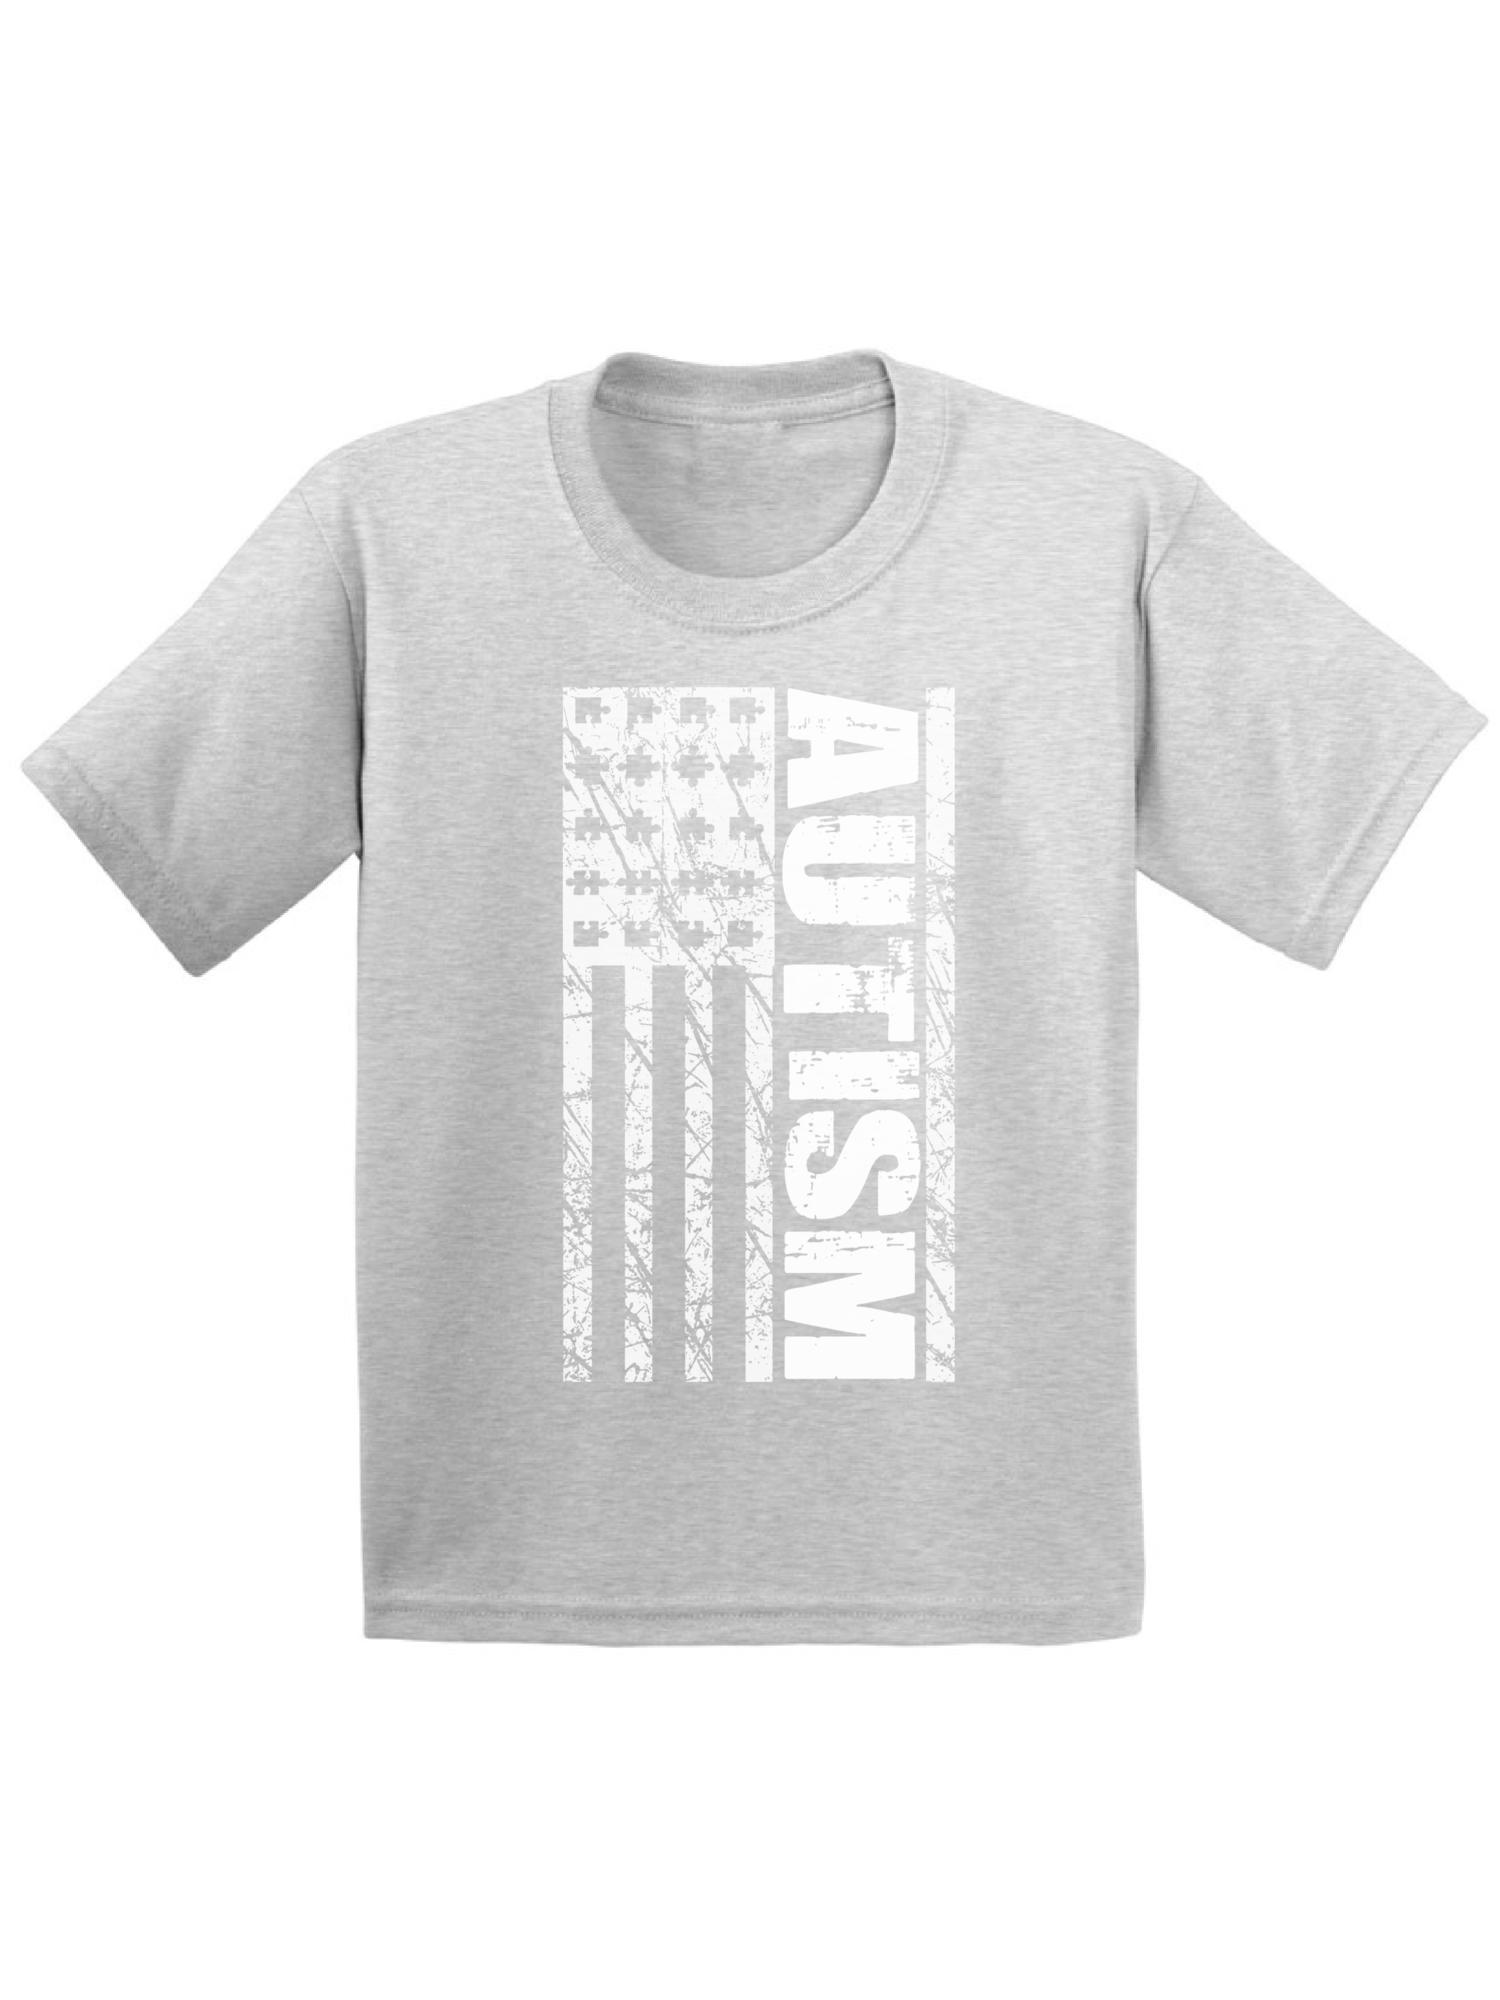 Awkward Styles Autism Flag Toddler Shirt Autism Awareness Shirts for Kids Autism Flag Tshirt Autism American Flag Shirt for Boys Autism Awareness Tshirt for Girls Autism Gifts for Kids Autism Shirts